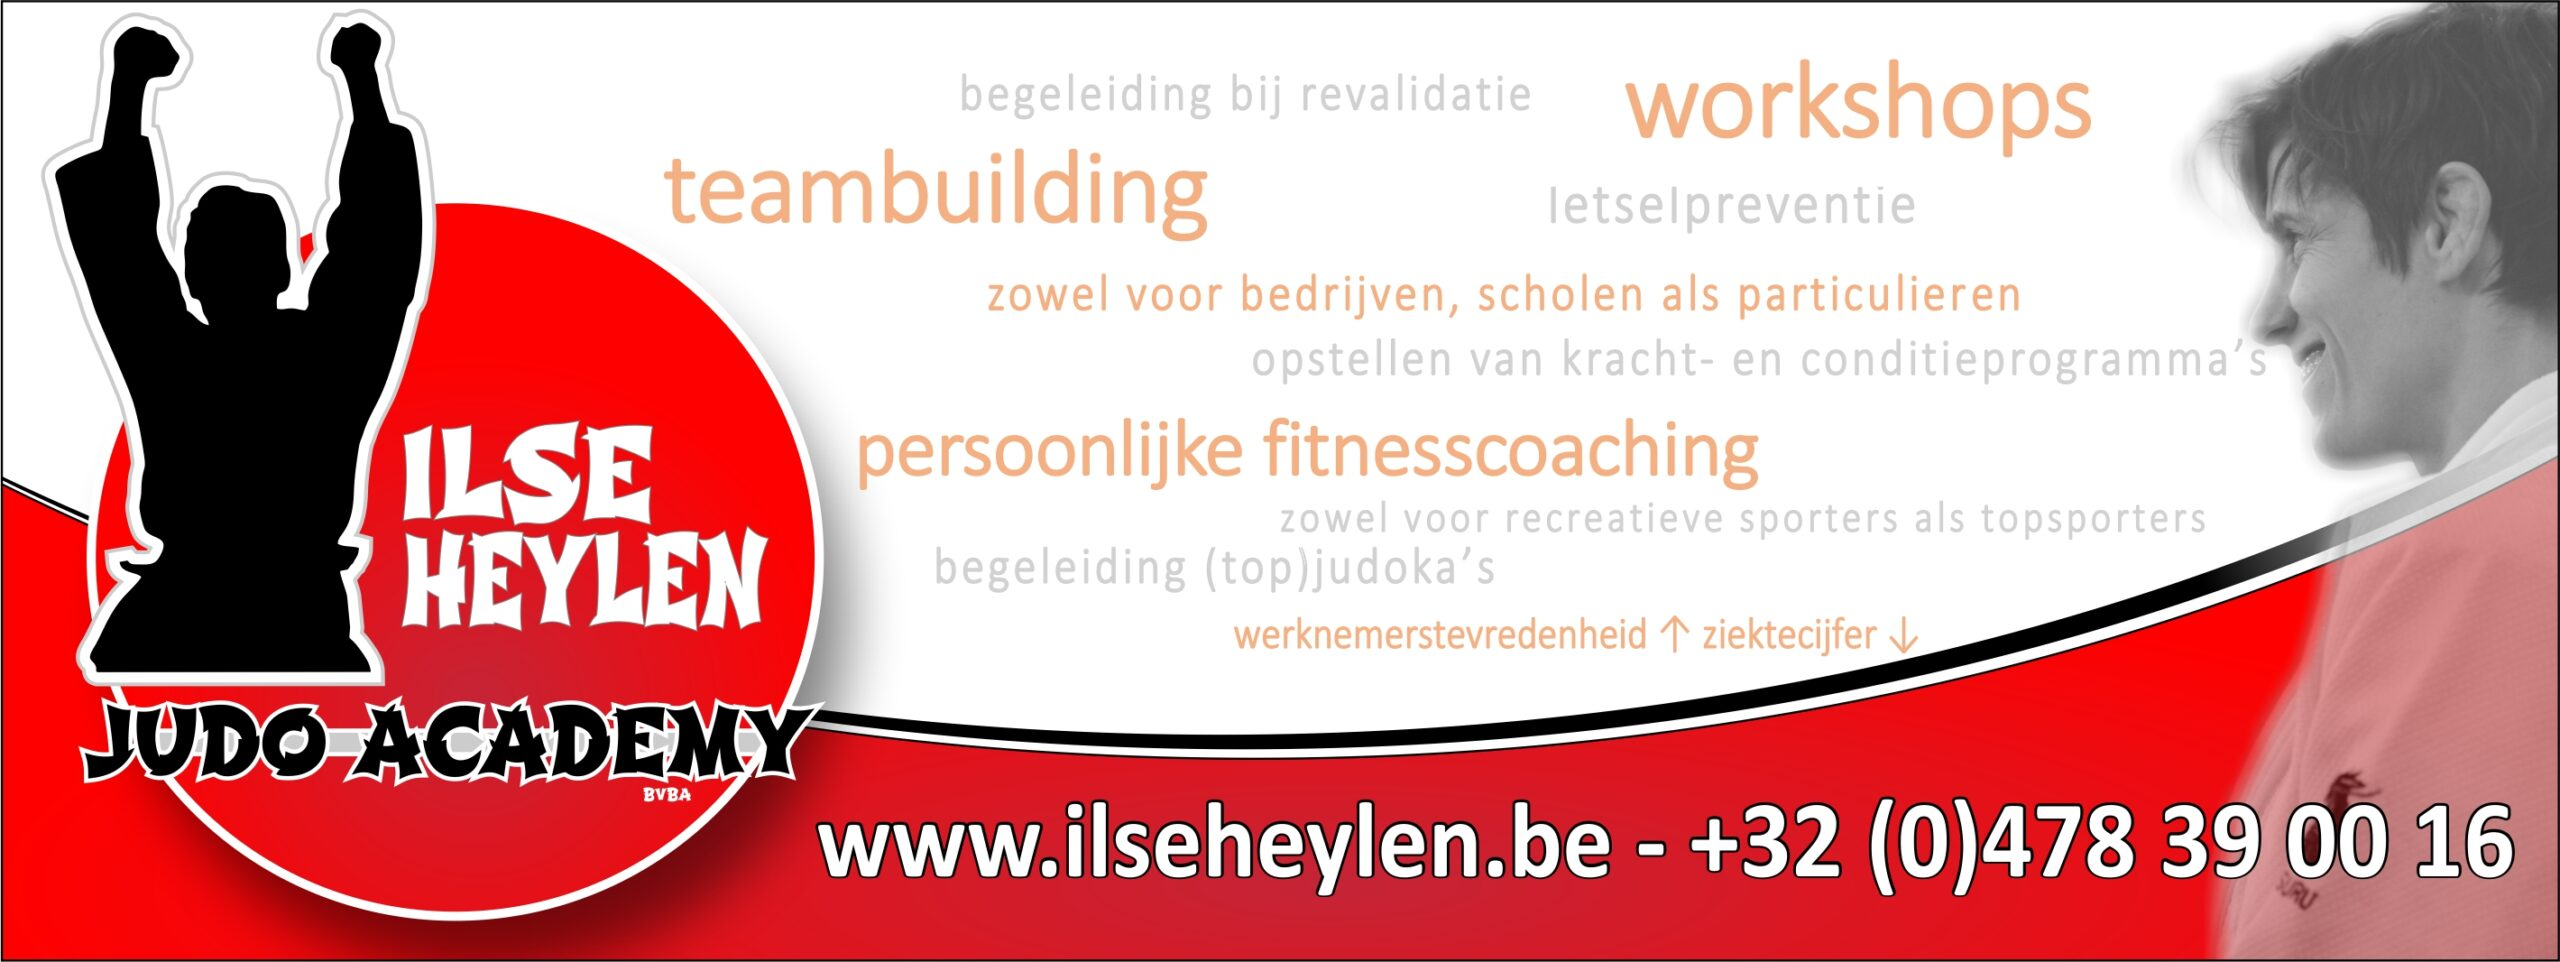 designmaker portfolio judoacademy Ilse Helyen